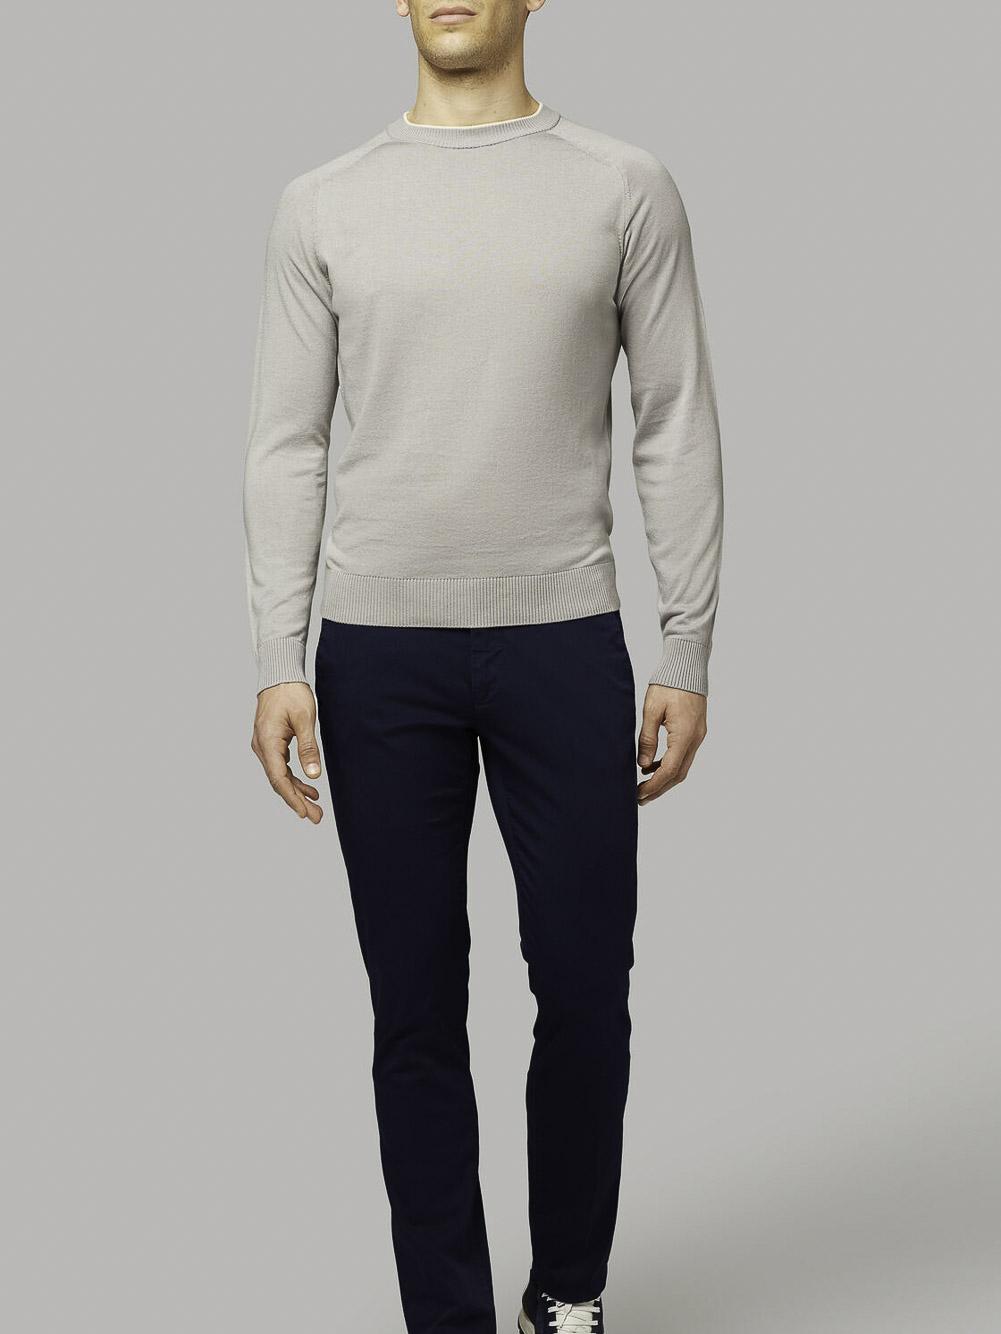 BOGGI Μπλούζα Τ-shirt B021P054105 ΜΠΕΖ